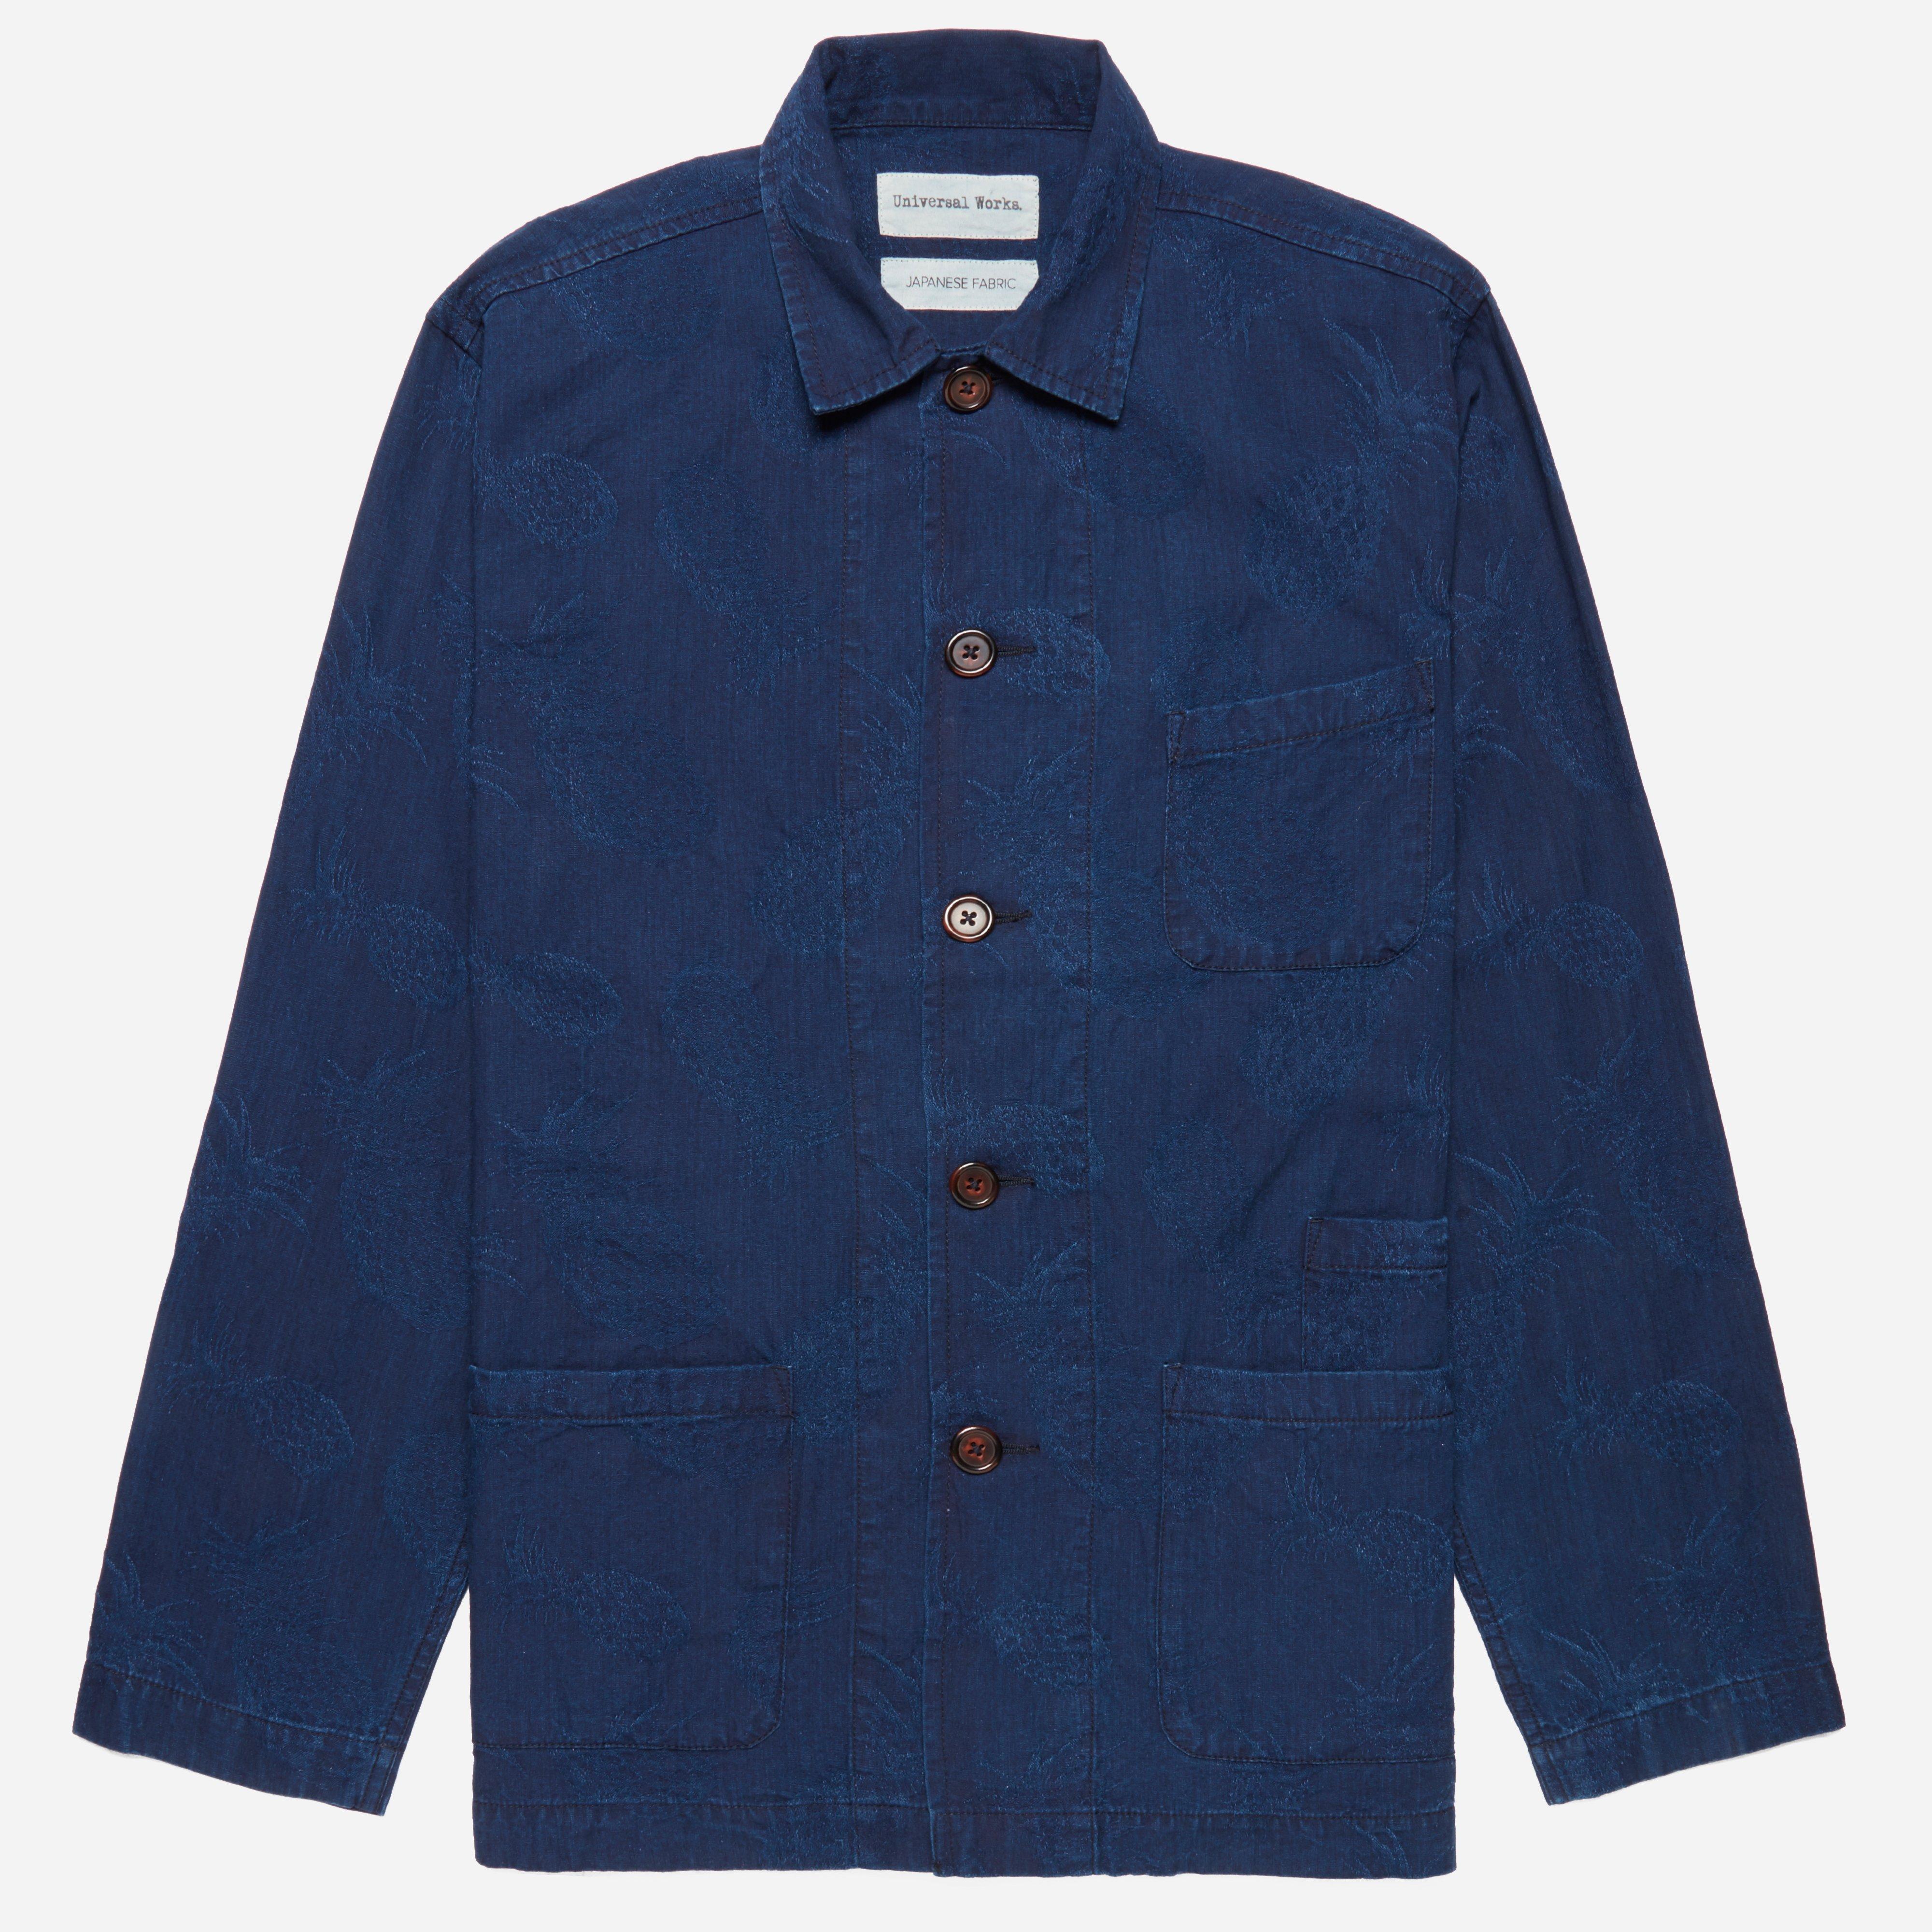 Universal Works Indigo Cotton Bakers Overshirt